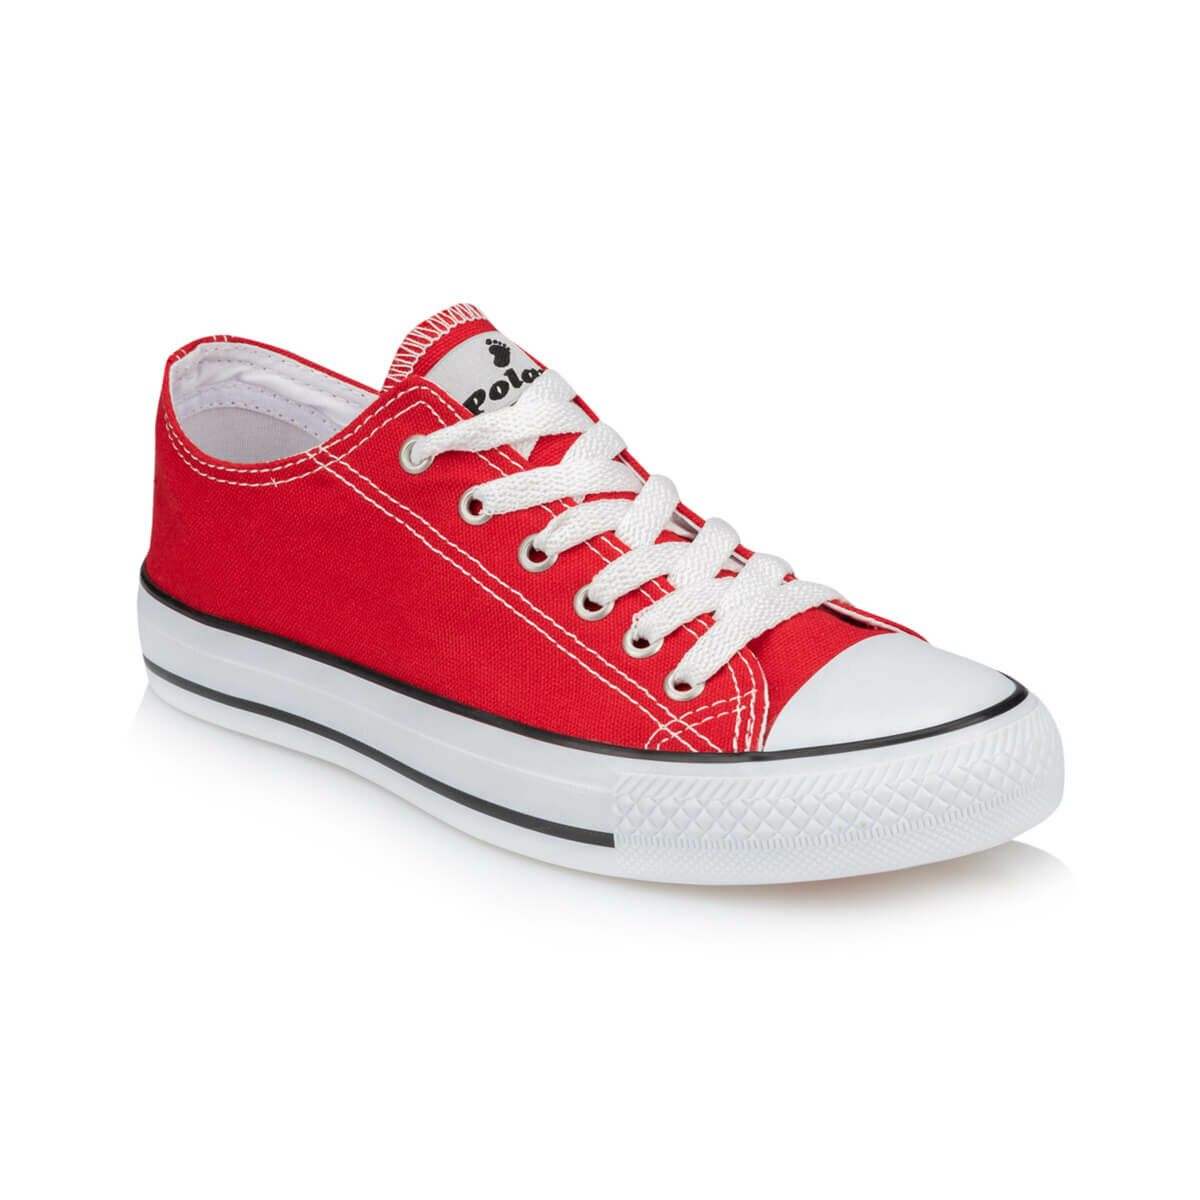 FLO 91.351646.Z Red Women 'S Sneaker Shoes Polaris